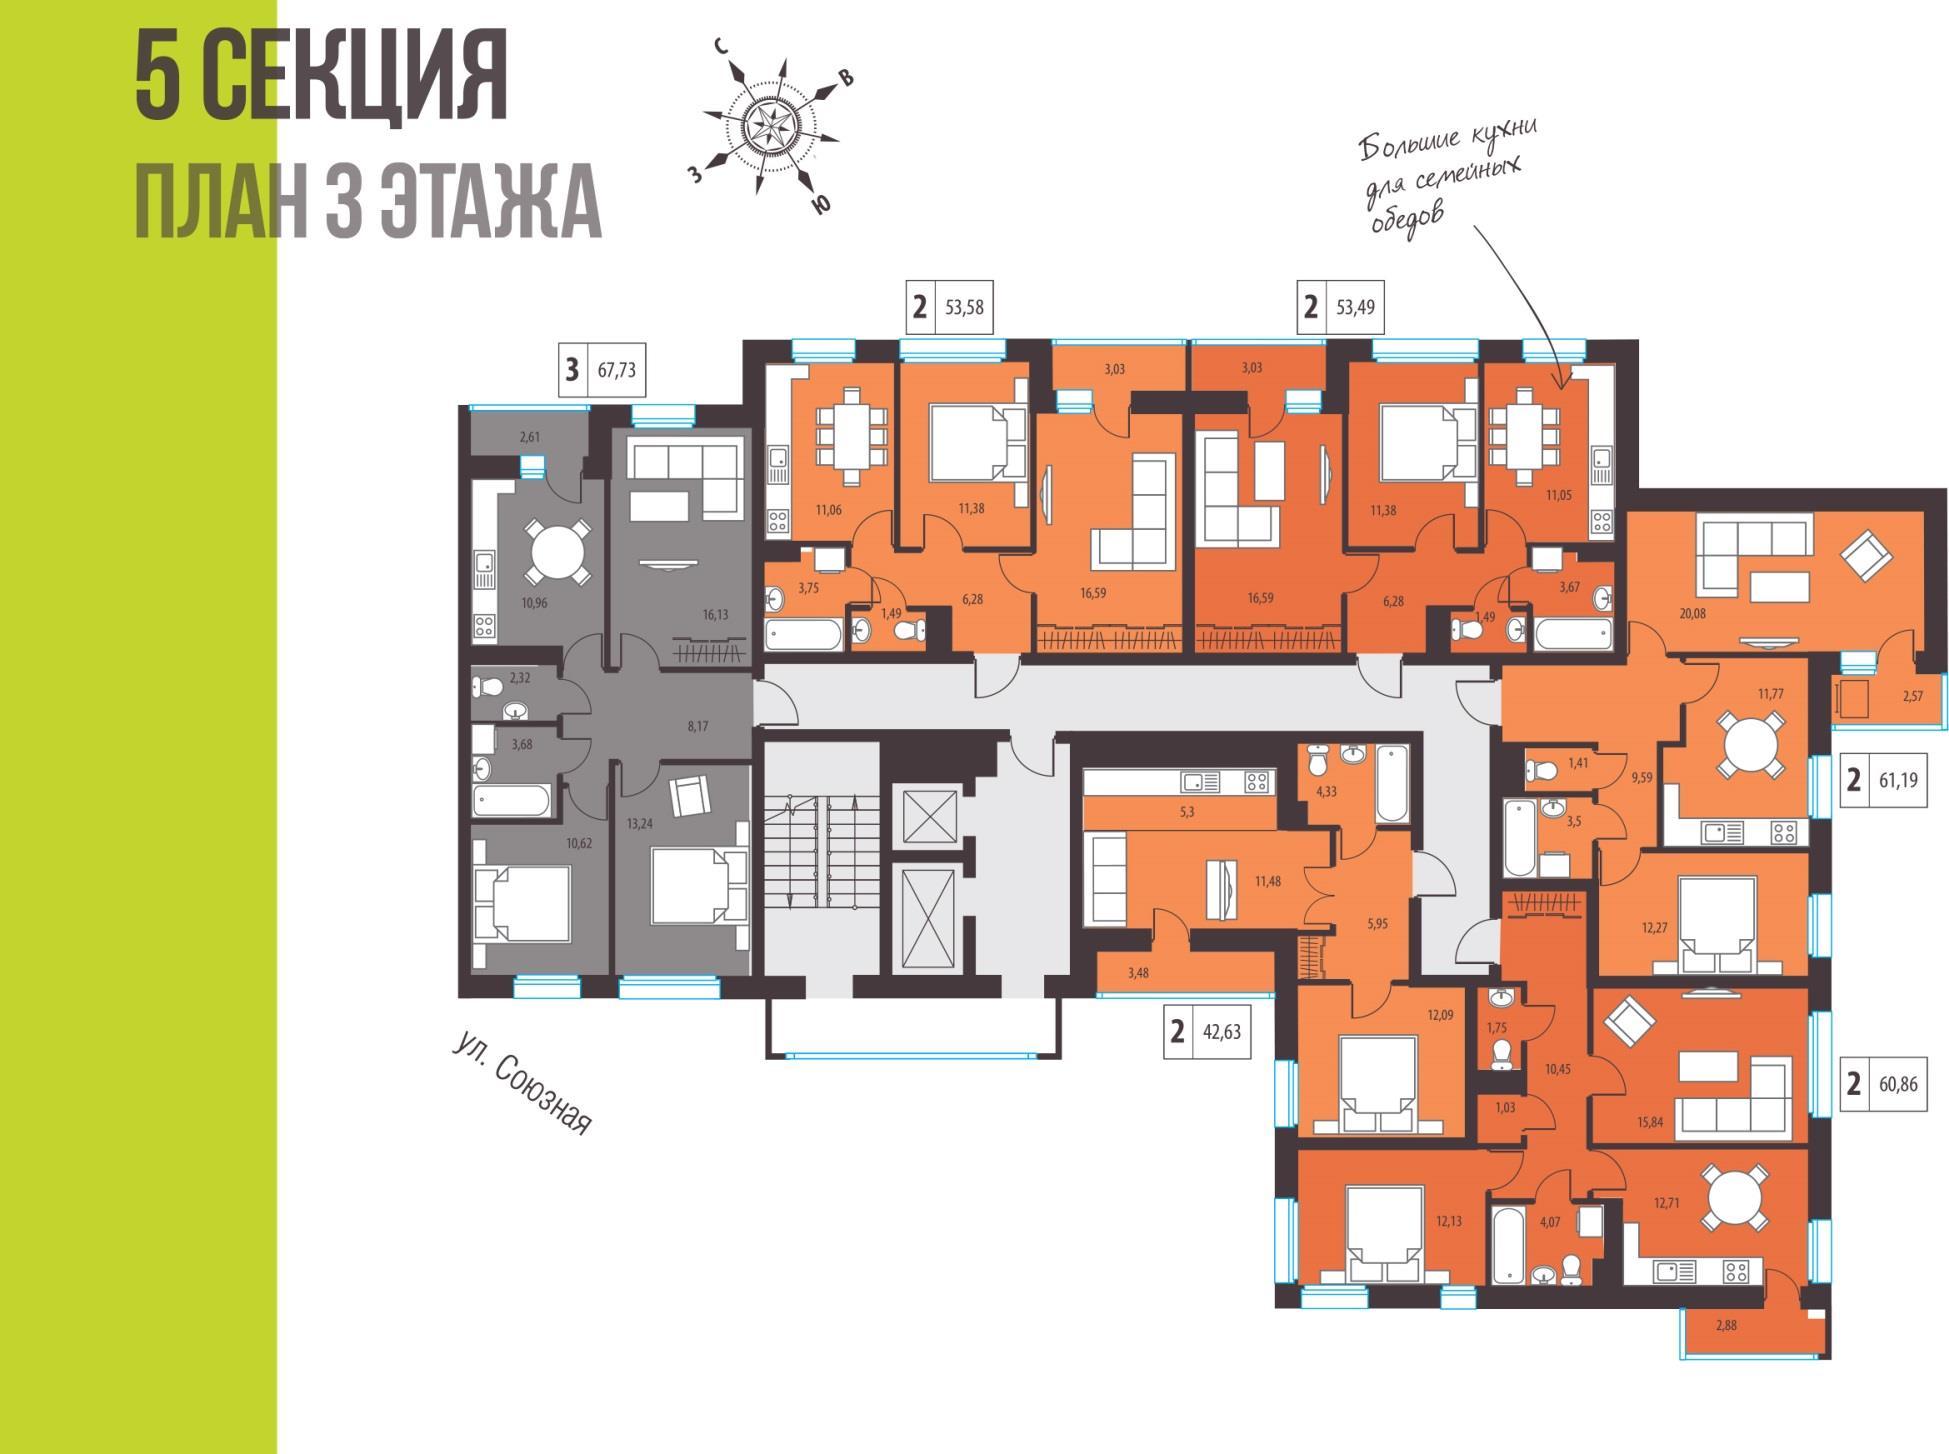 5я секция. план 3го этажа